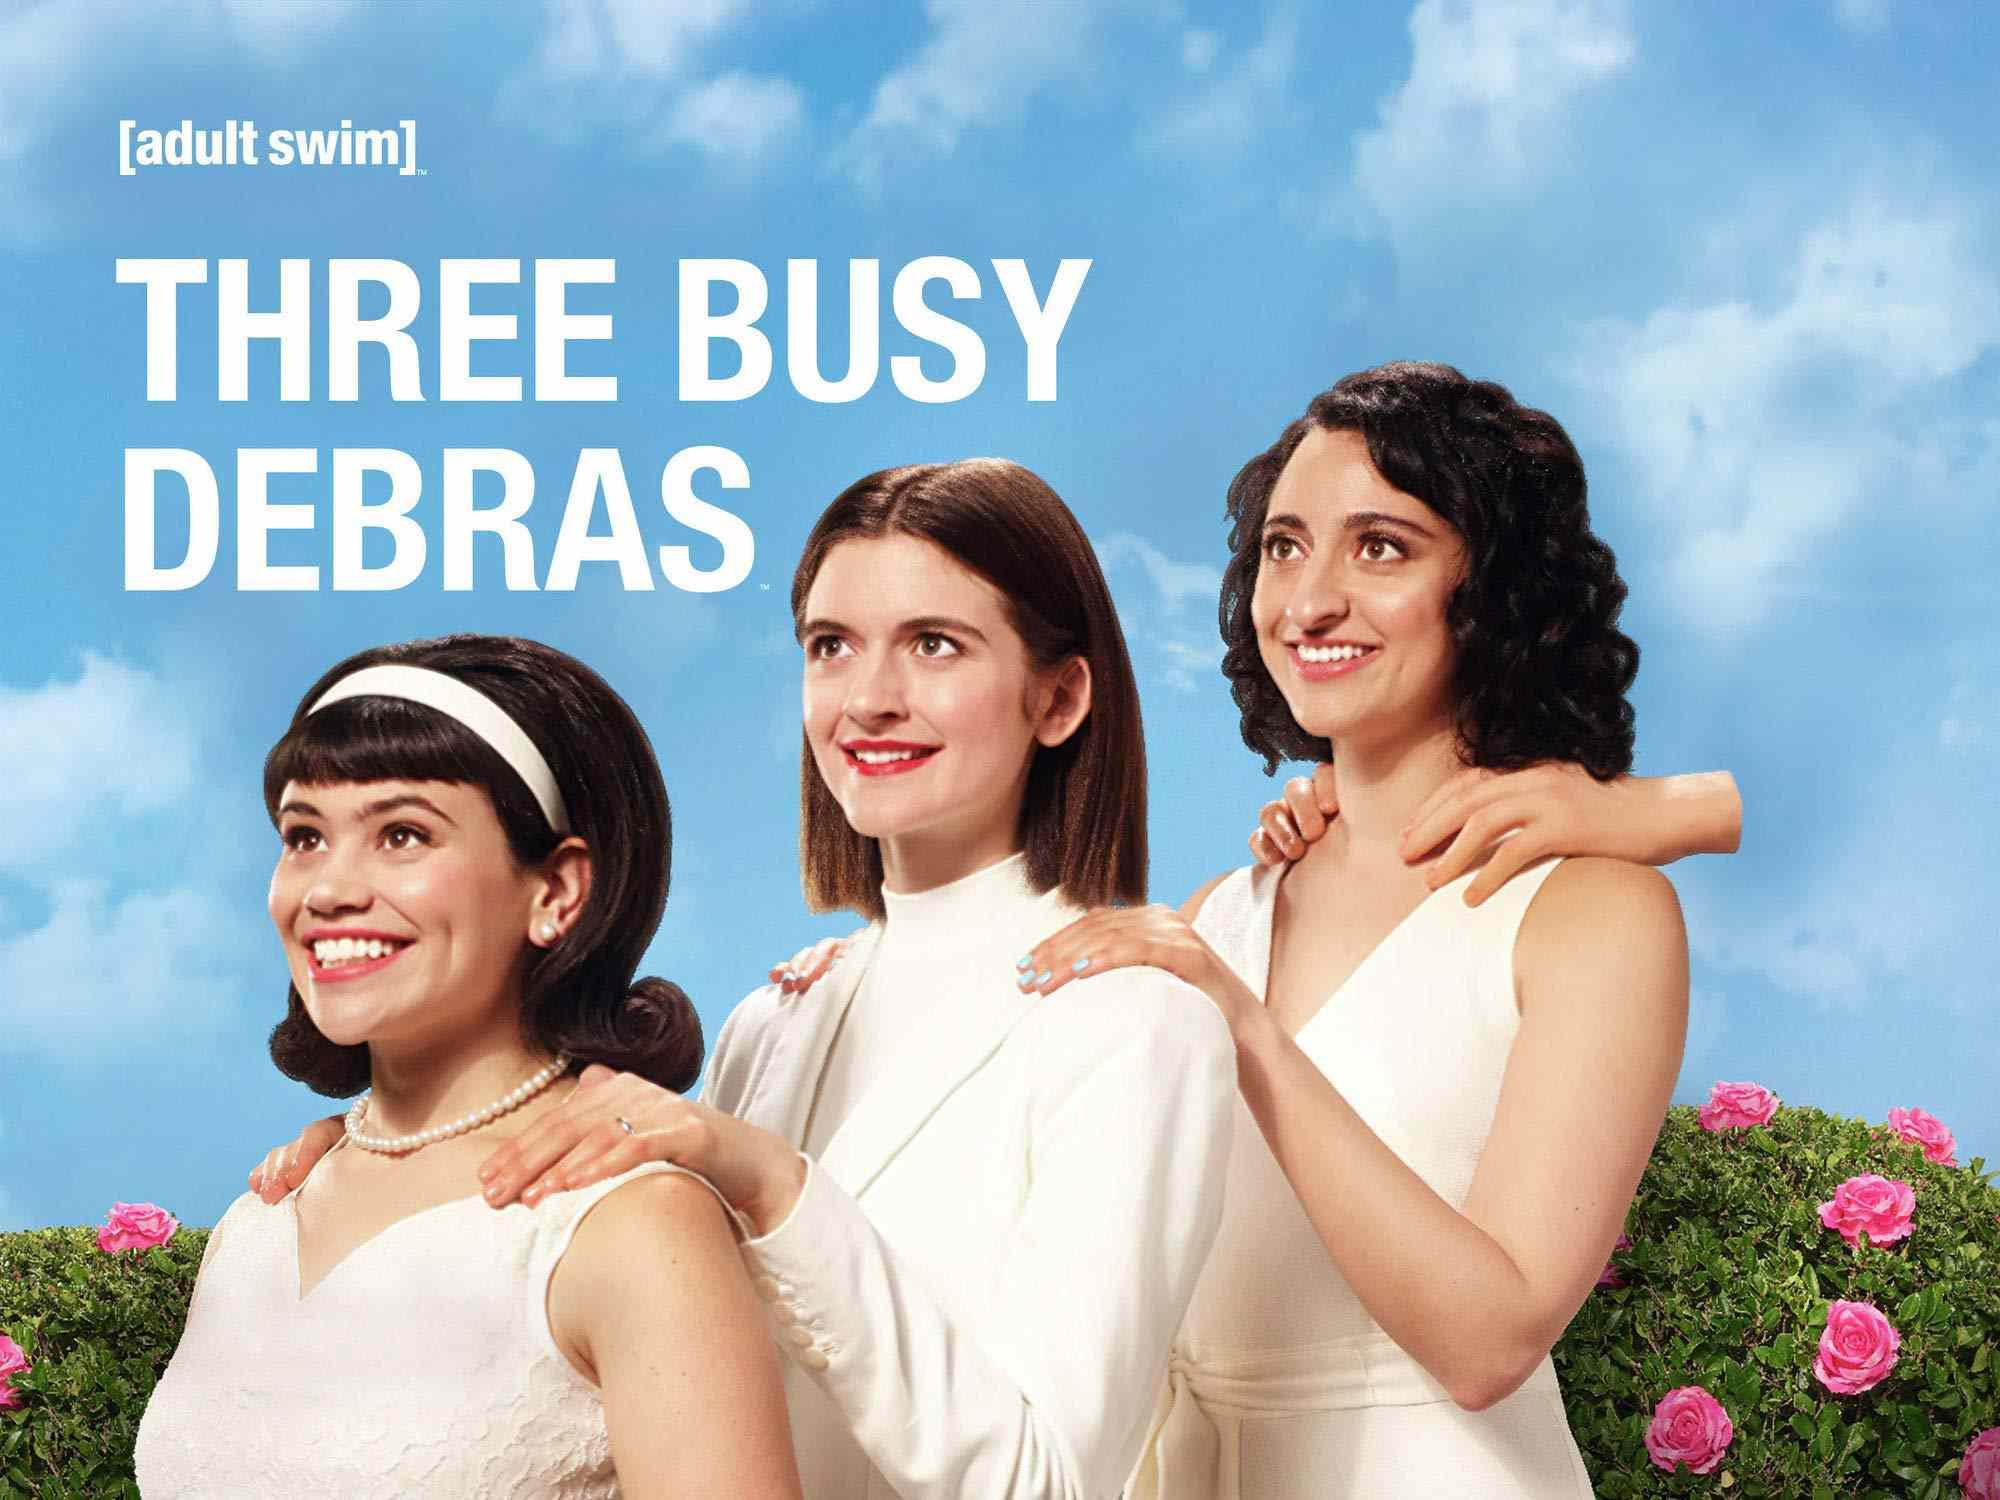 The cast of Three Busy Debras